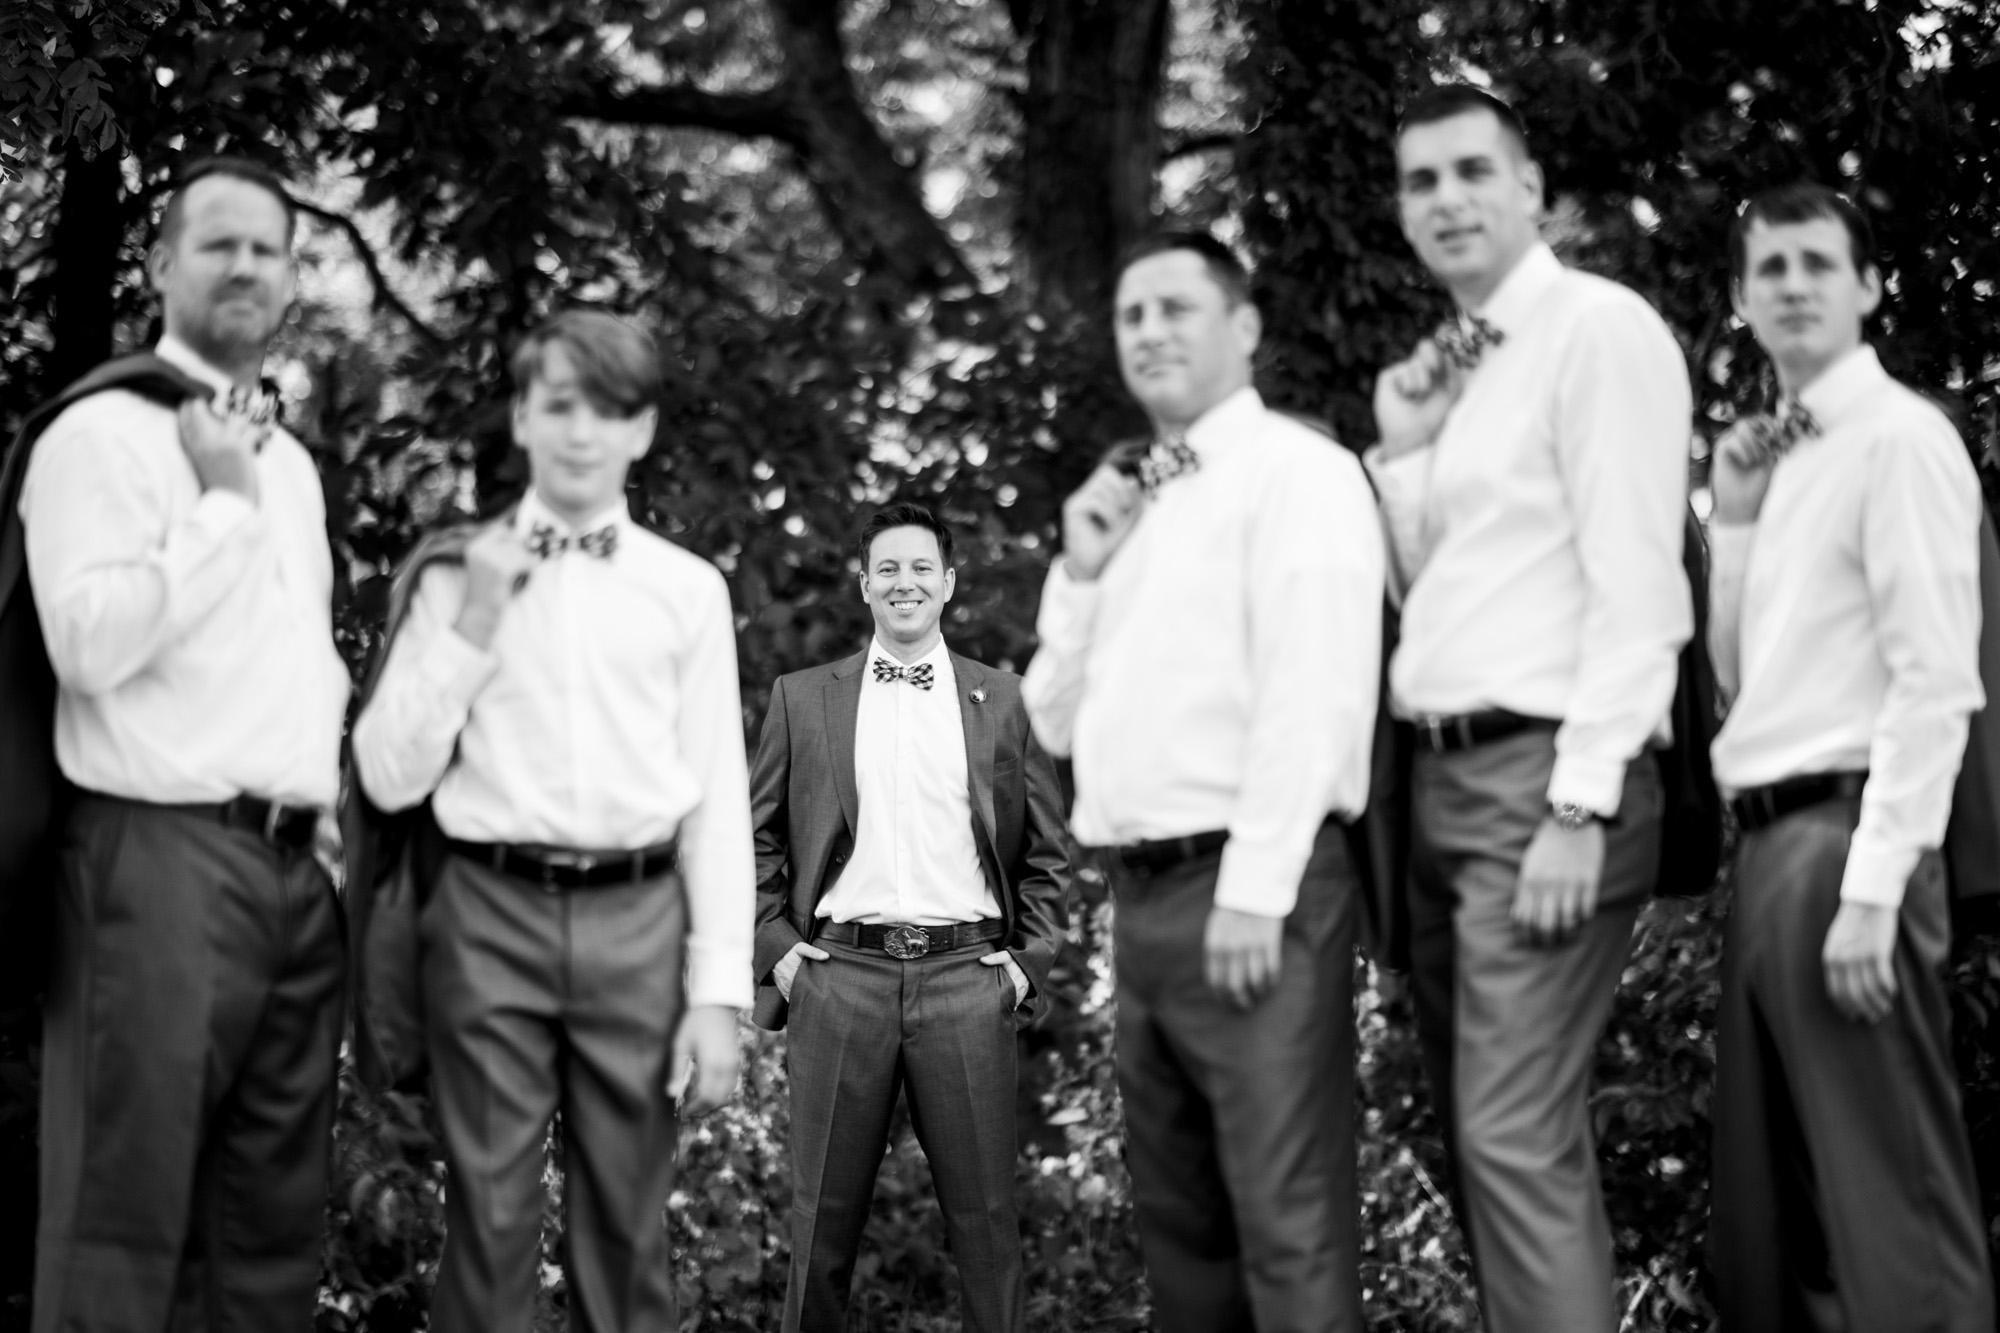 Seriously_Sabrina_Photography_Bowling_Green_Kentucky_Highland_Stables_Wedding_Wolff37.jpg